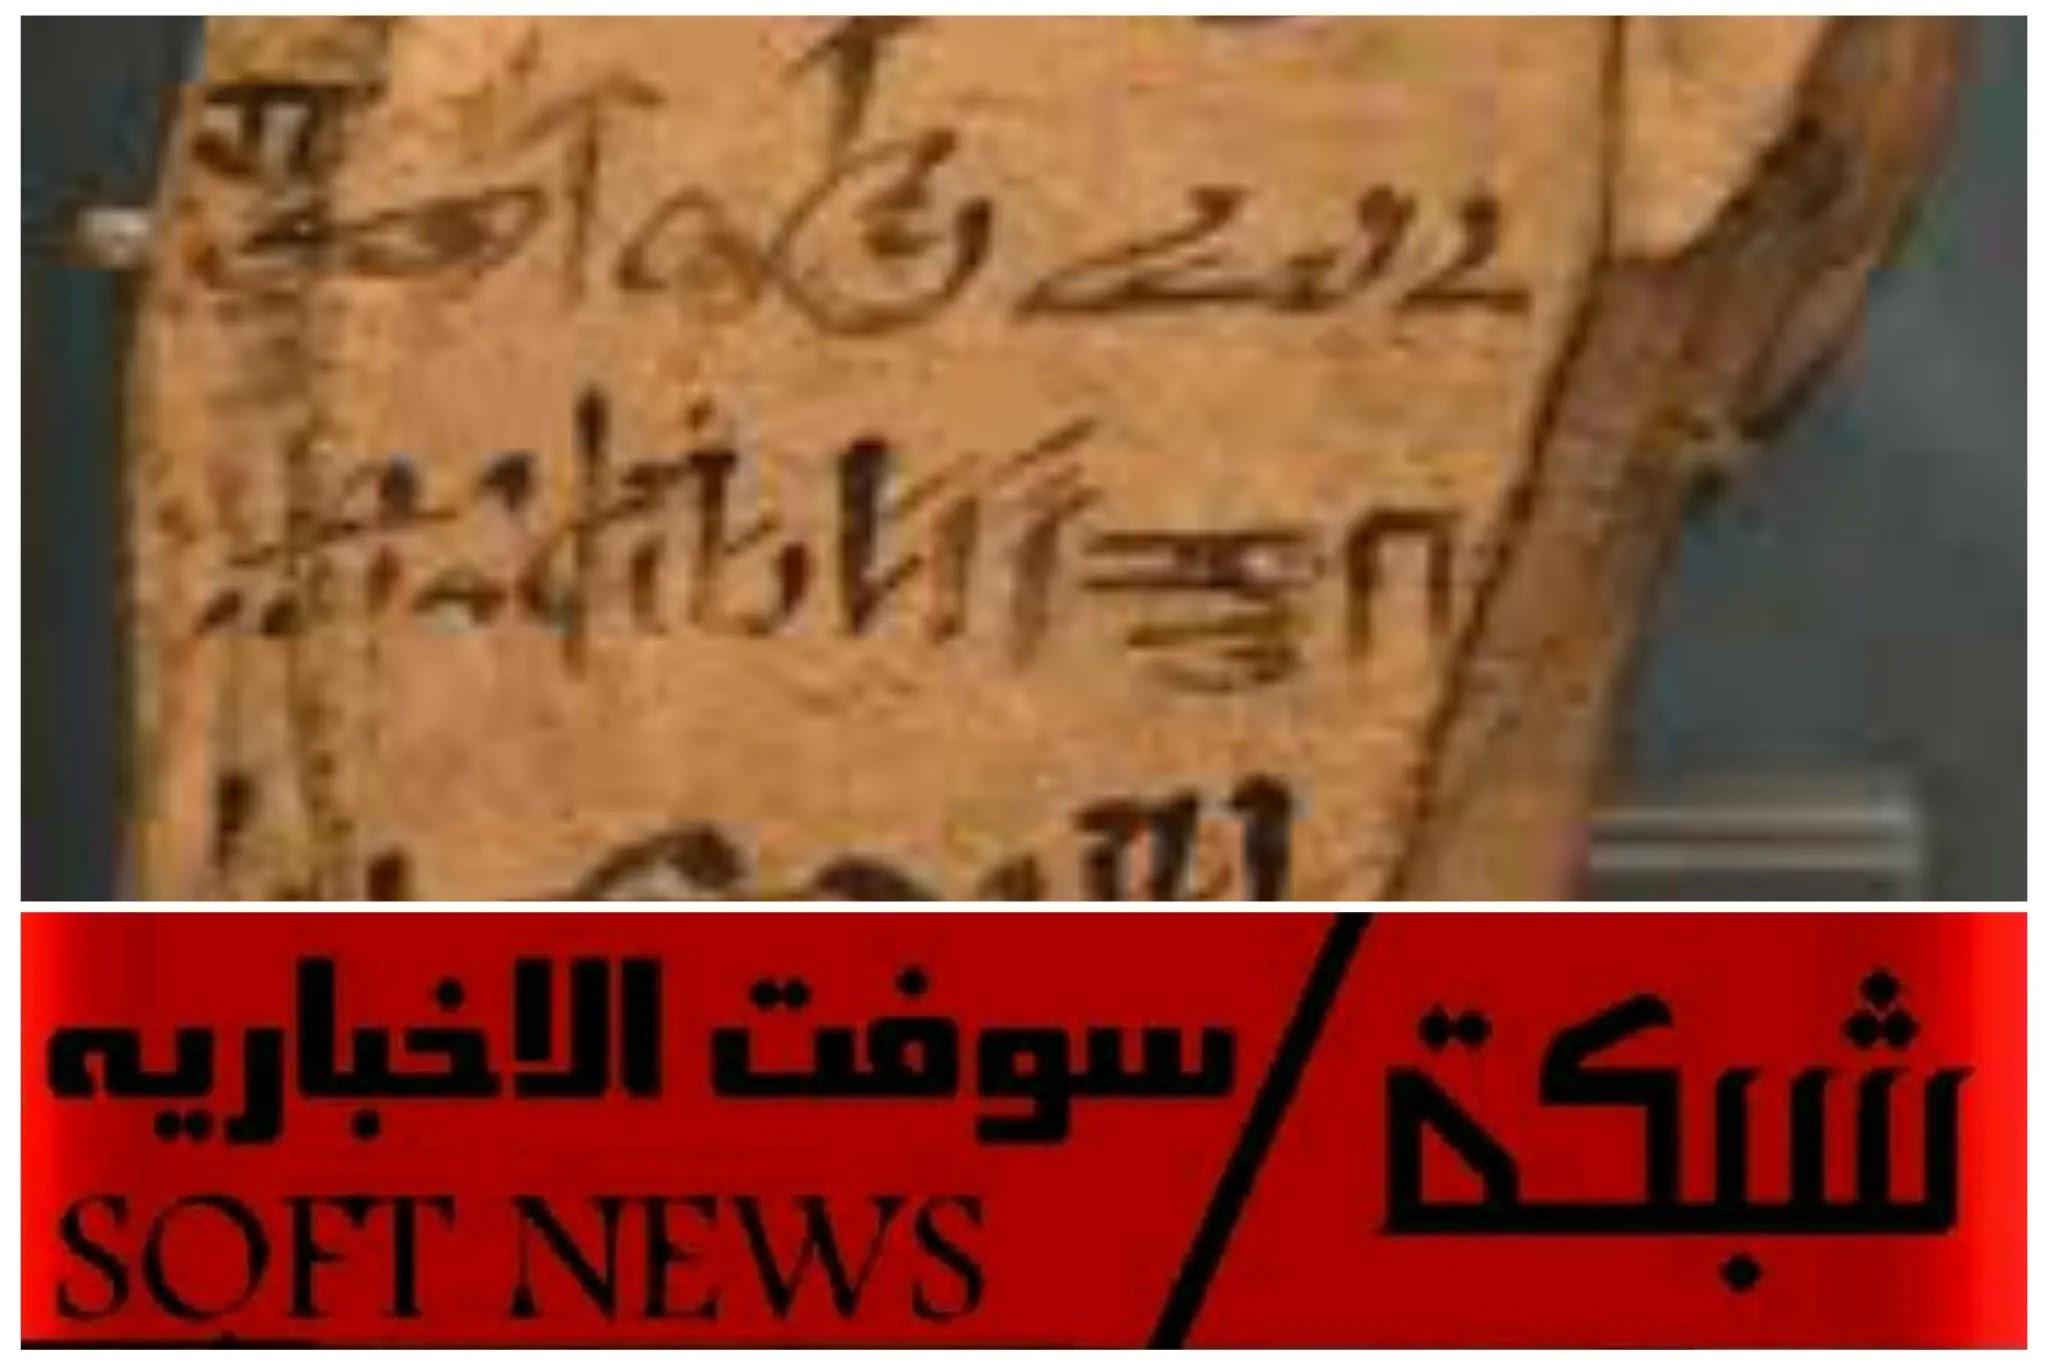 اخبار مصر : نقش مصري قديم يحذر من كارثه مصريه مدمره